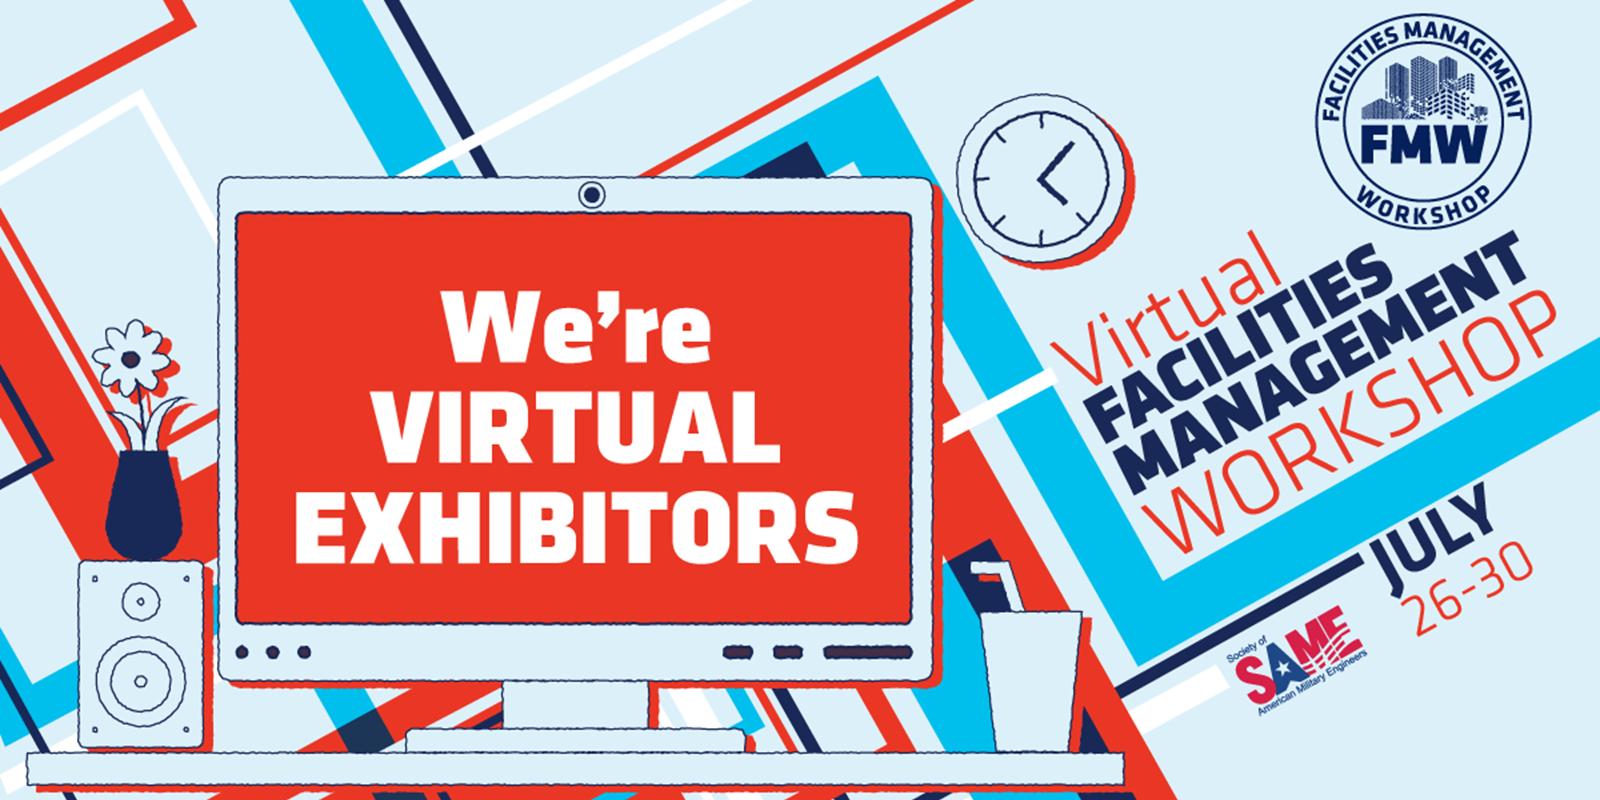 VFMW Exhibitor Graphic